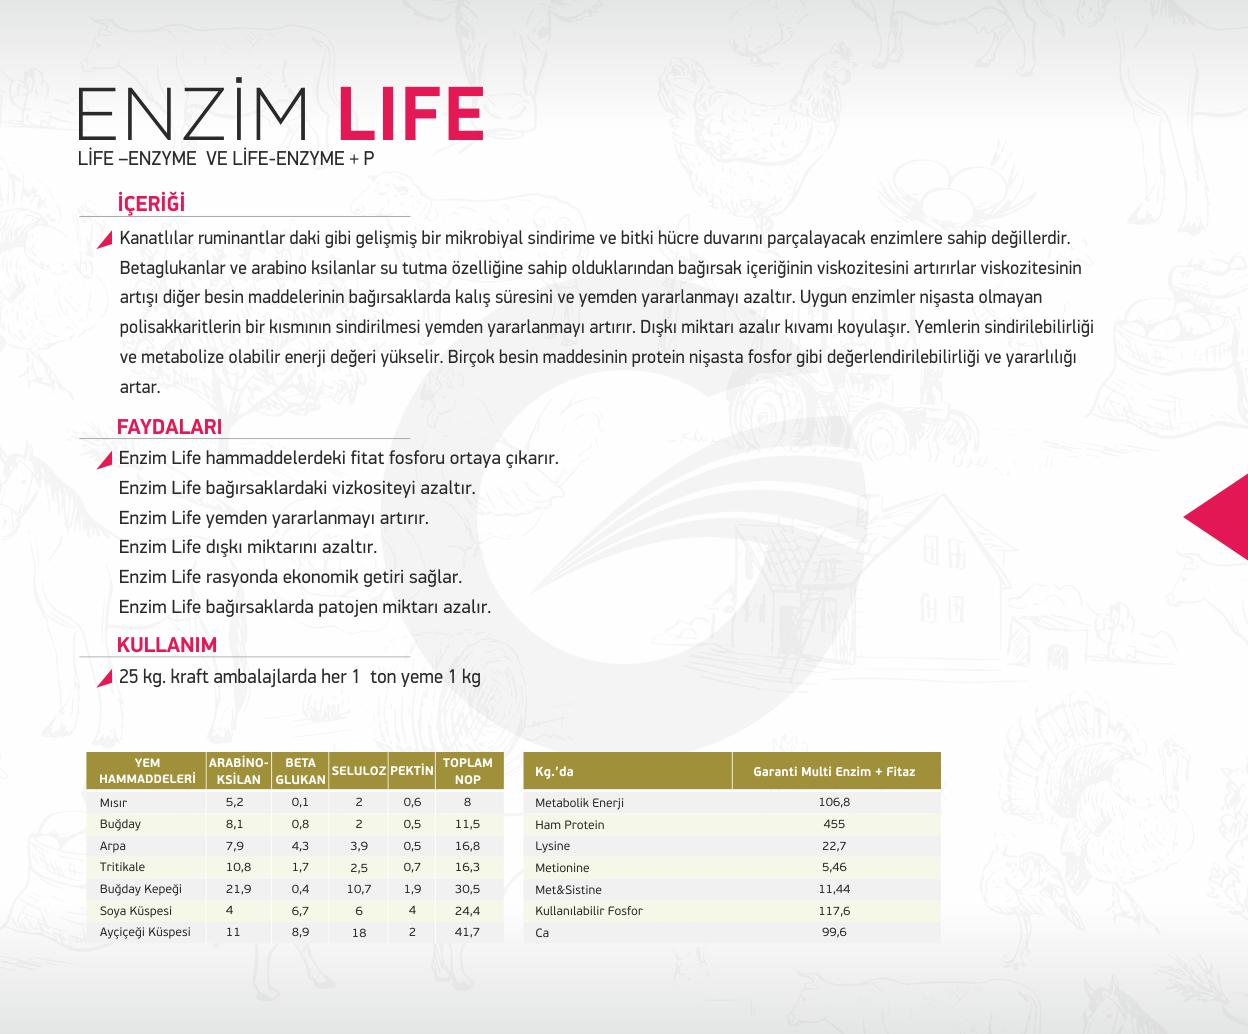 enzim life